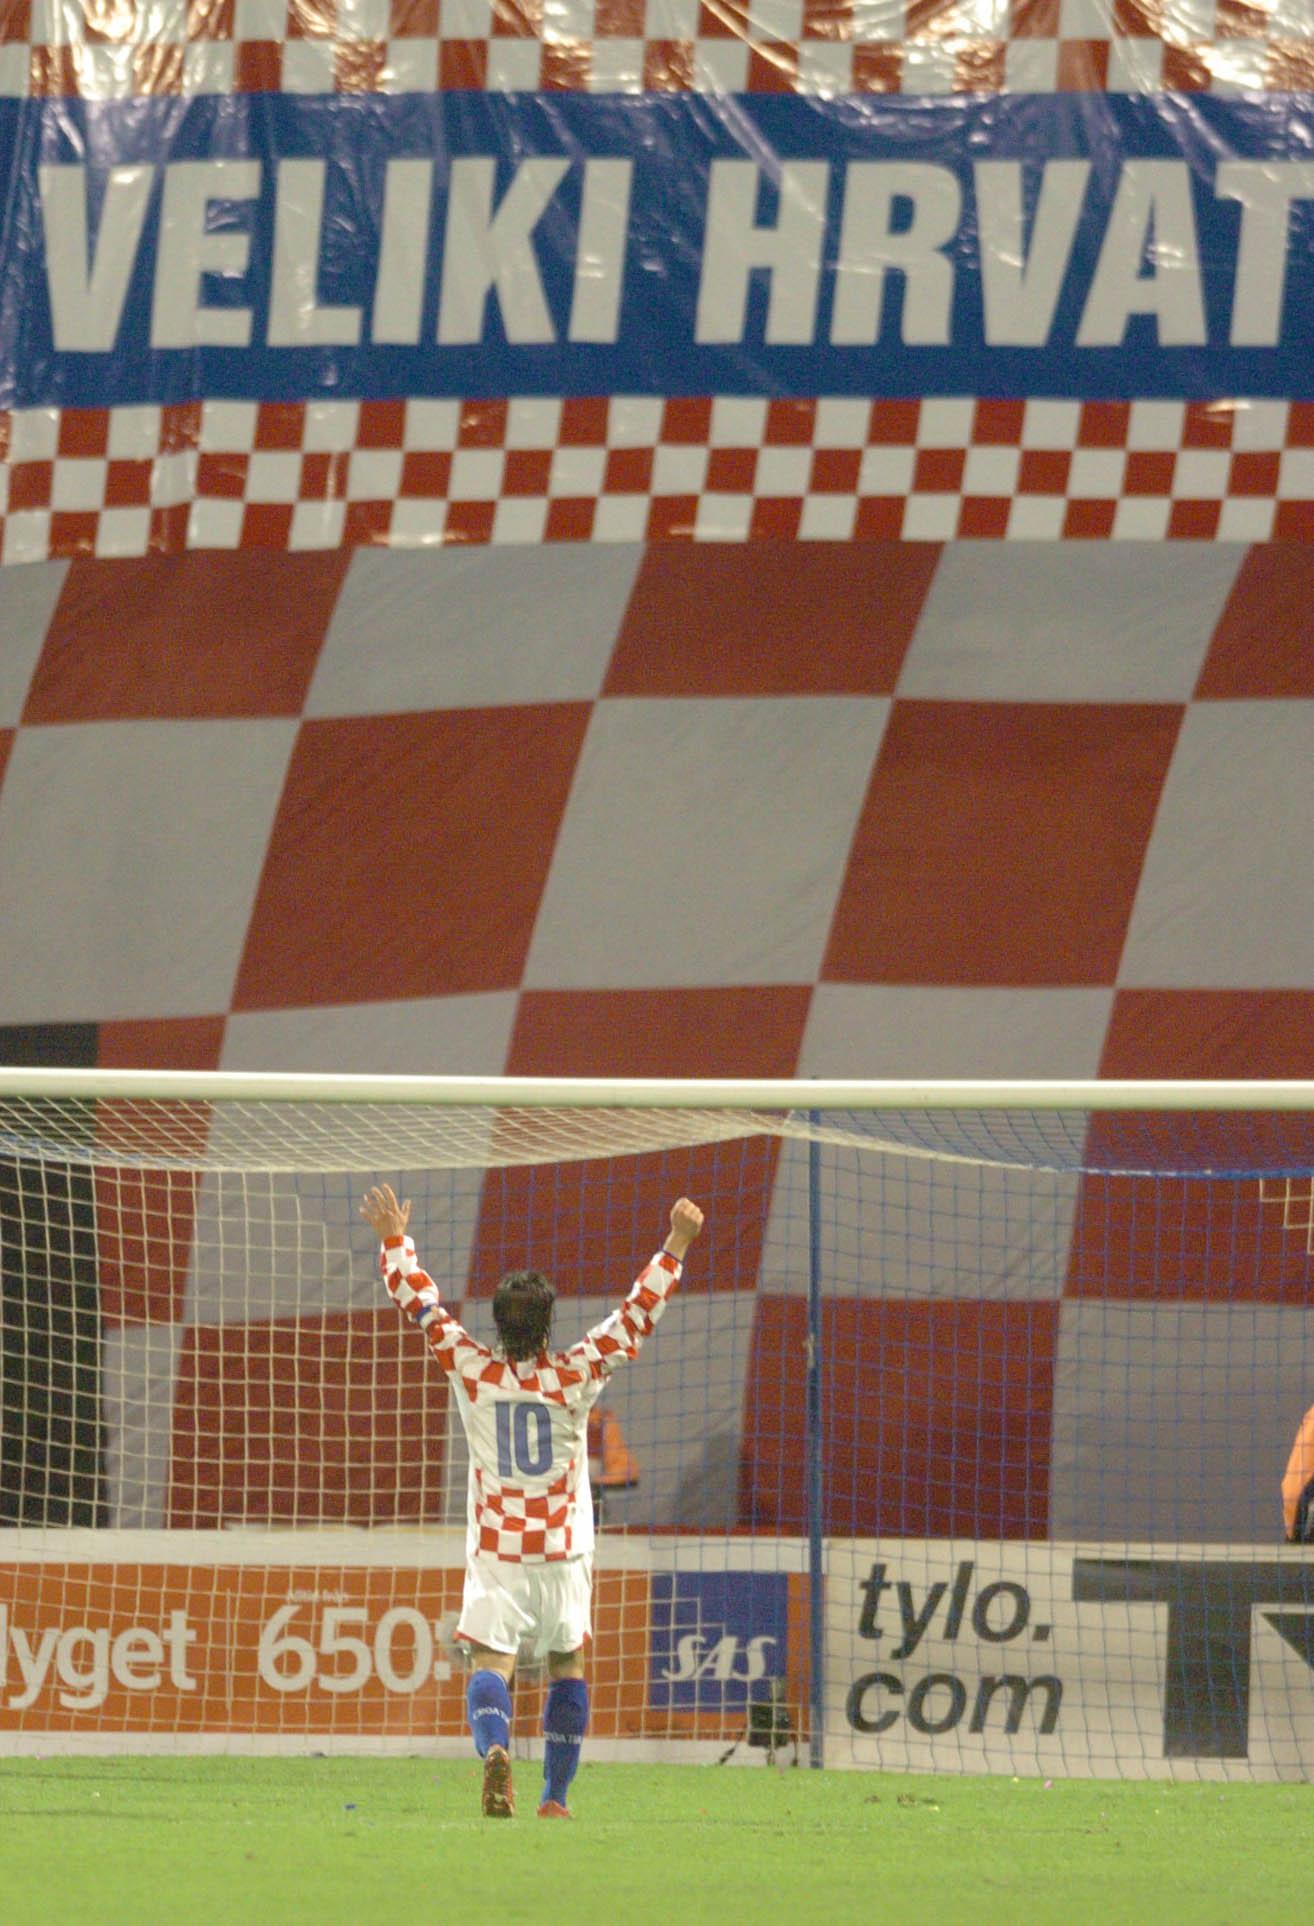 08.10.2005. Hrvatska - Svedska 1 - 0   Niko Kovac   snimio N Dugi